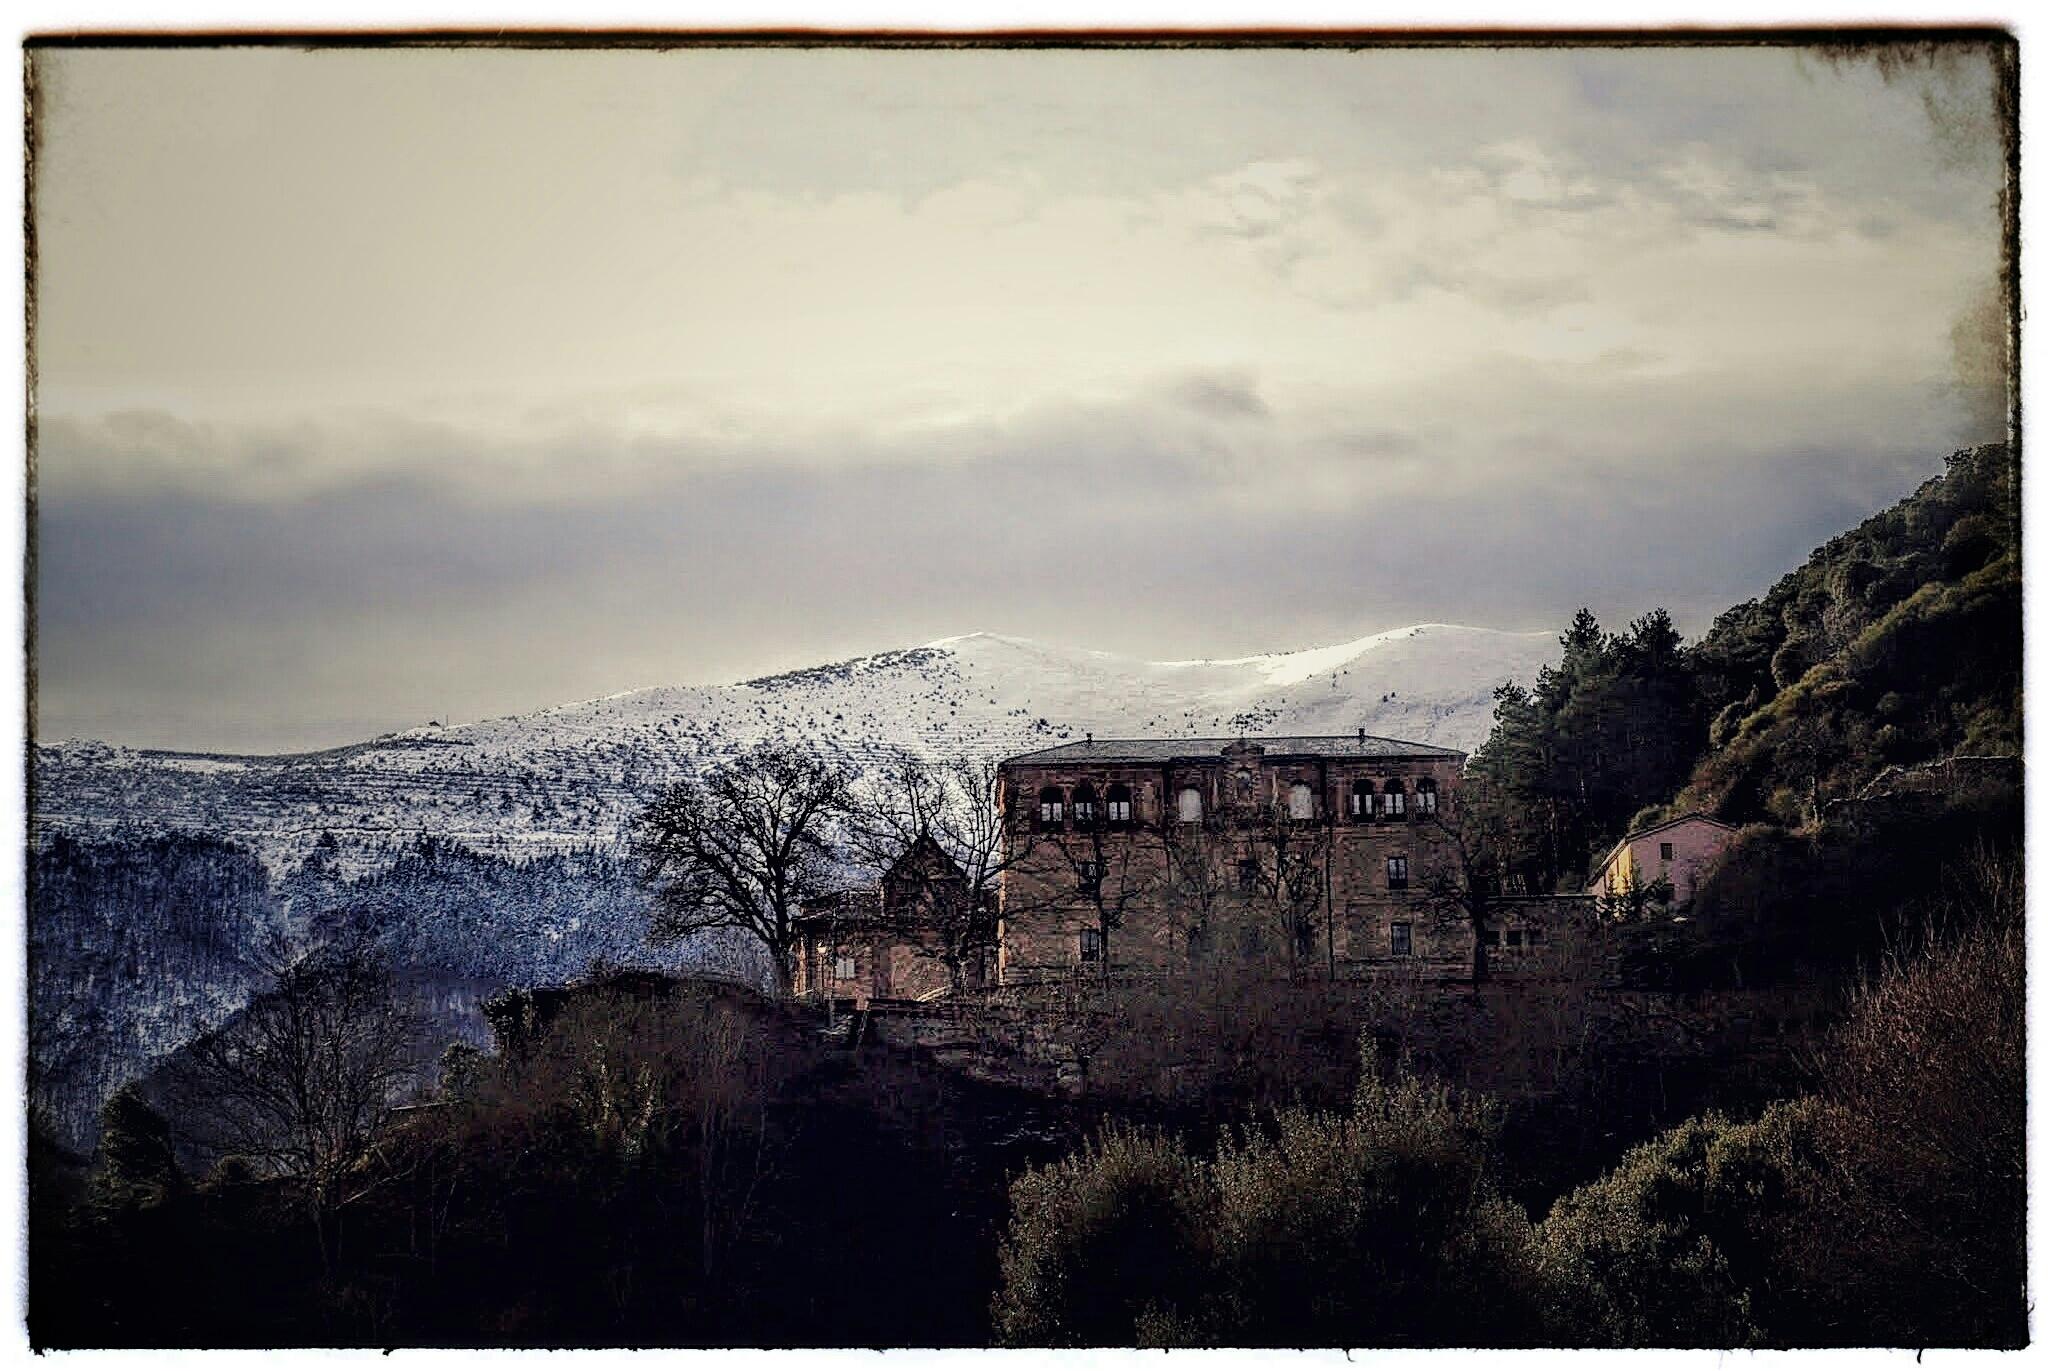 P1176794-03-01 De Nájera a Valvanera (La Rioja) Rutas